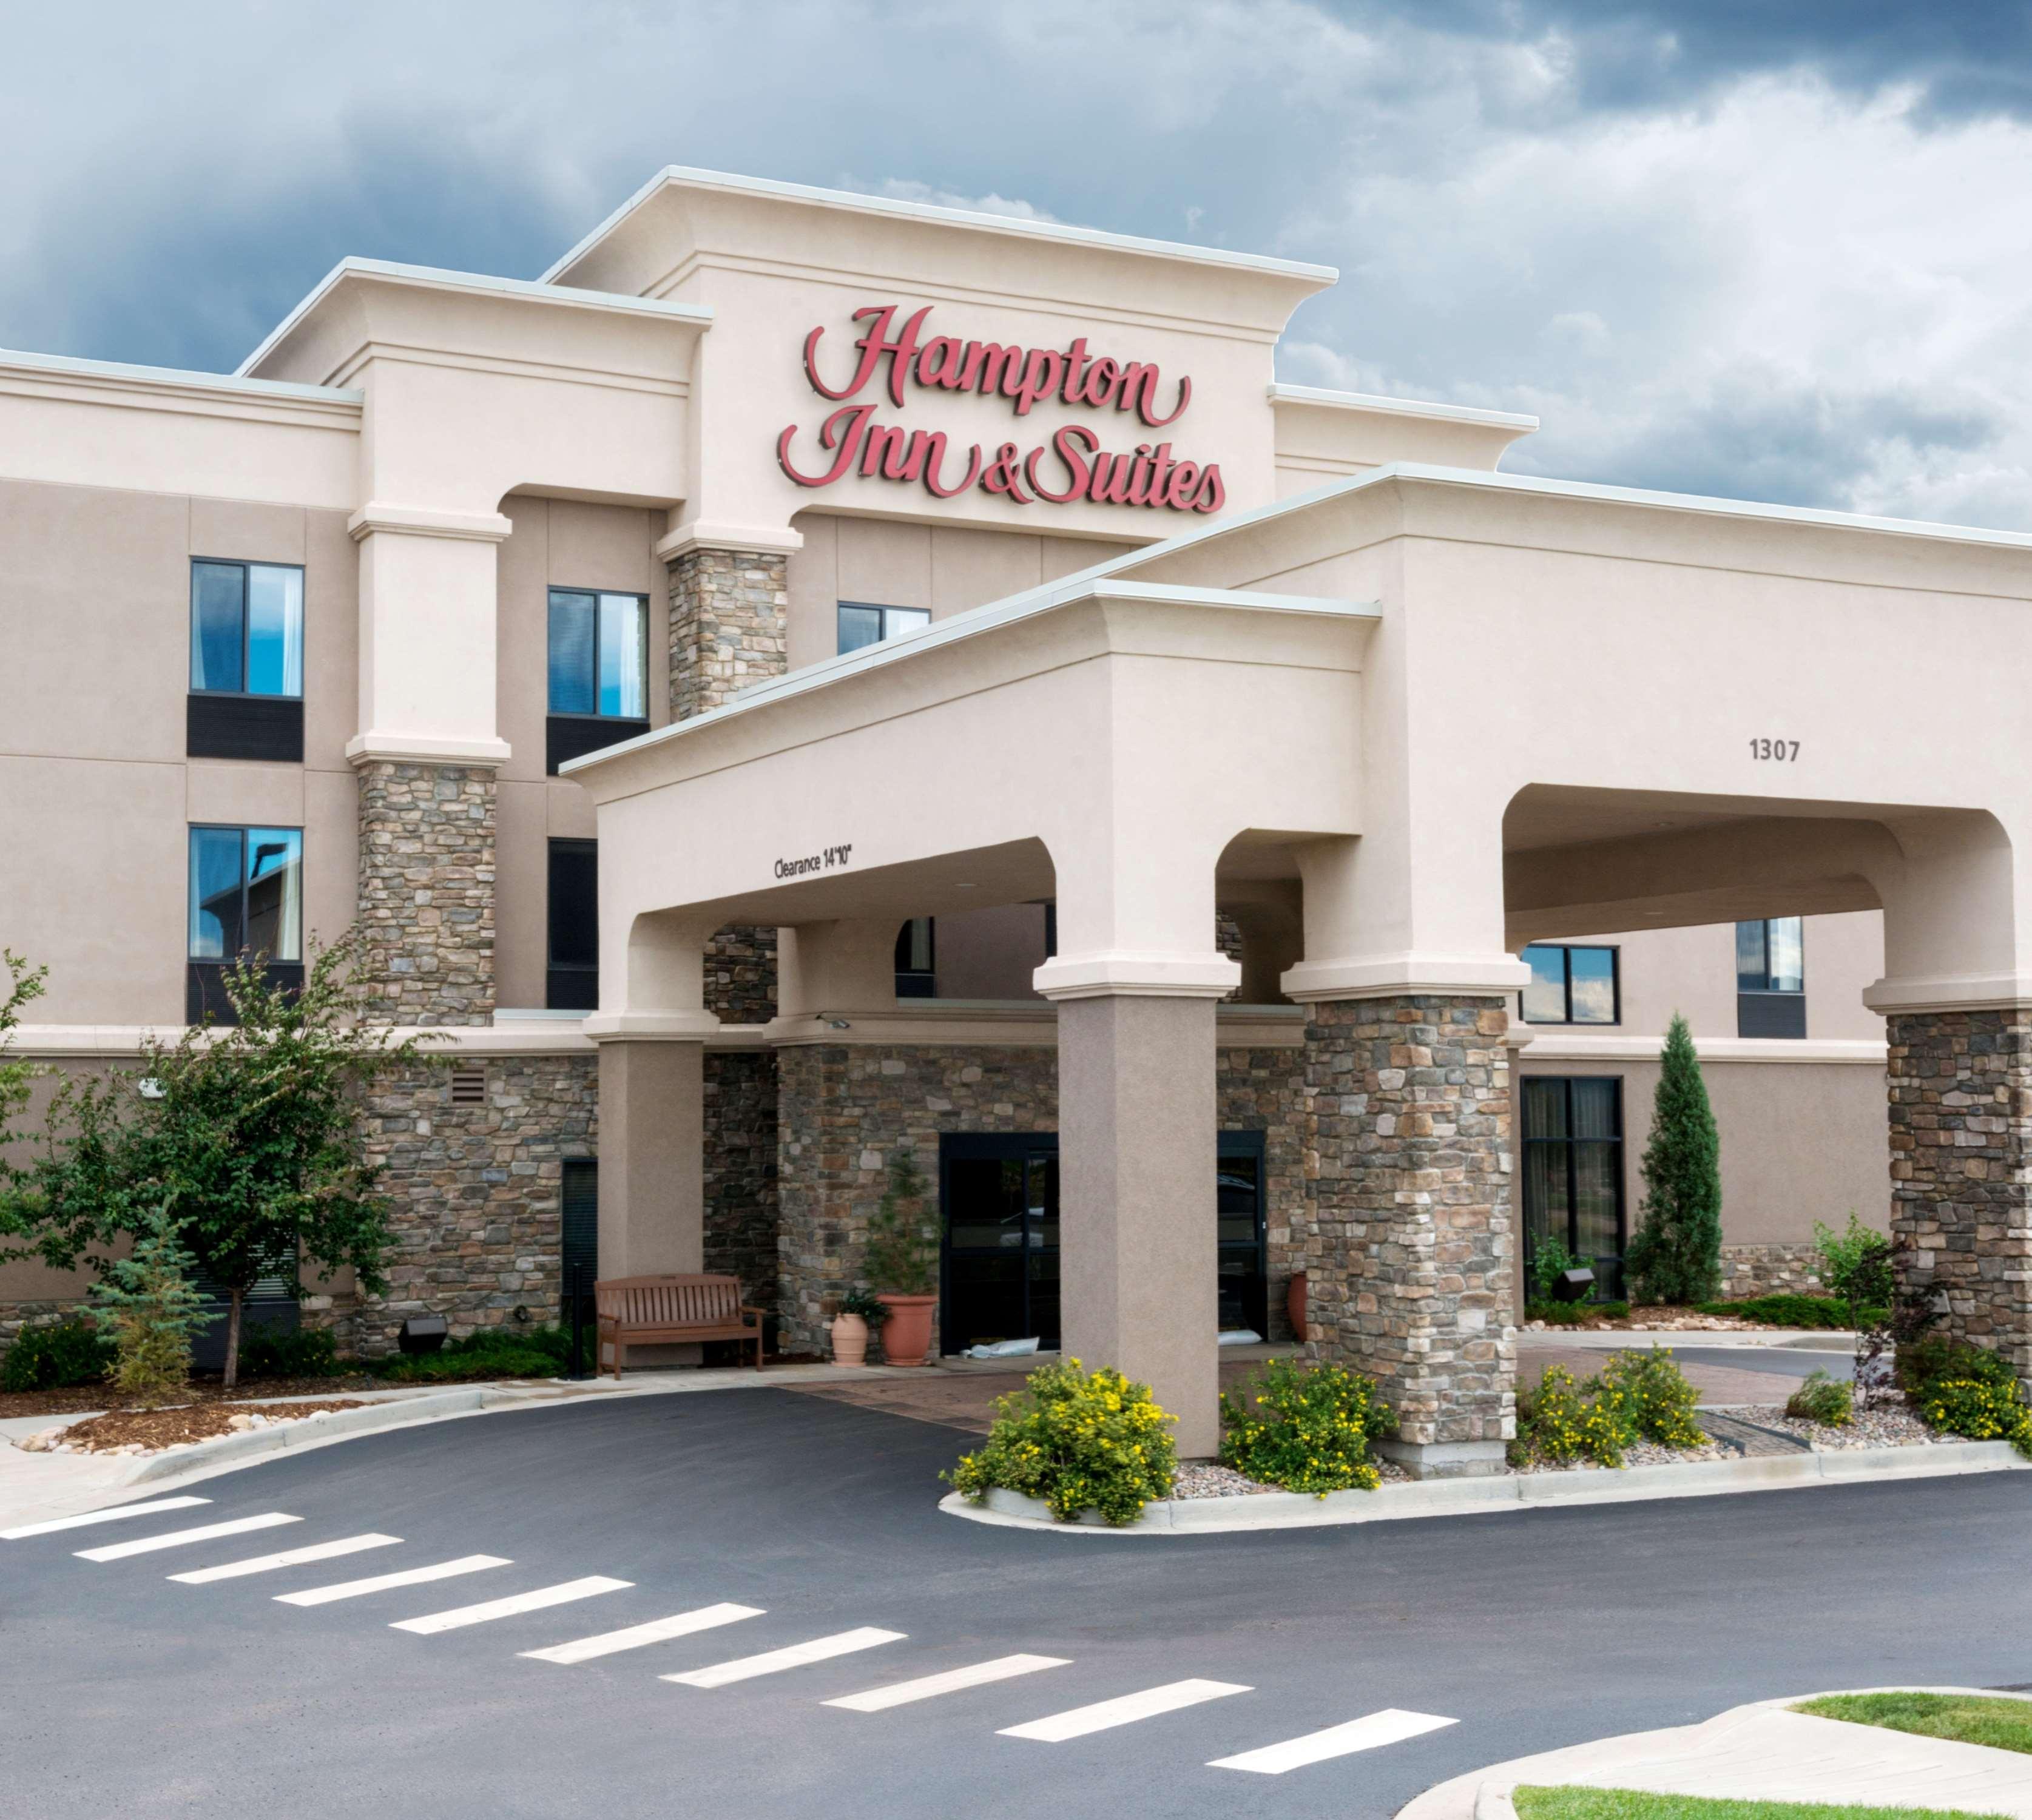 Hampton Inn & Suites Colorado Springs-Air Force Academy-I-25 North